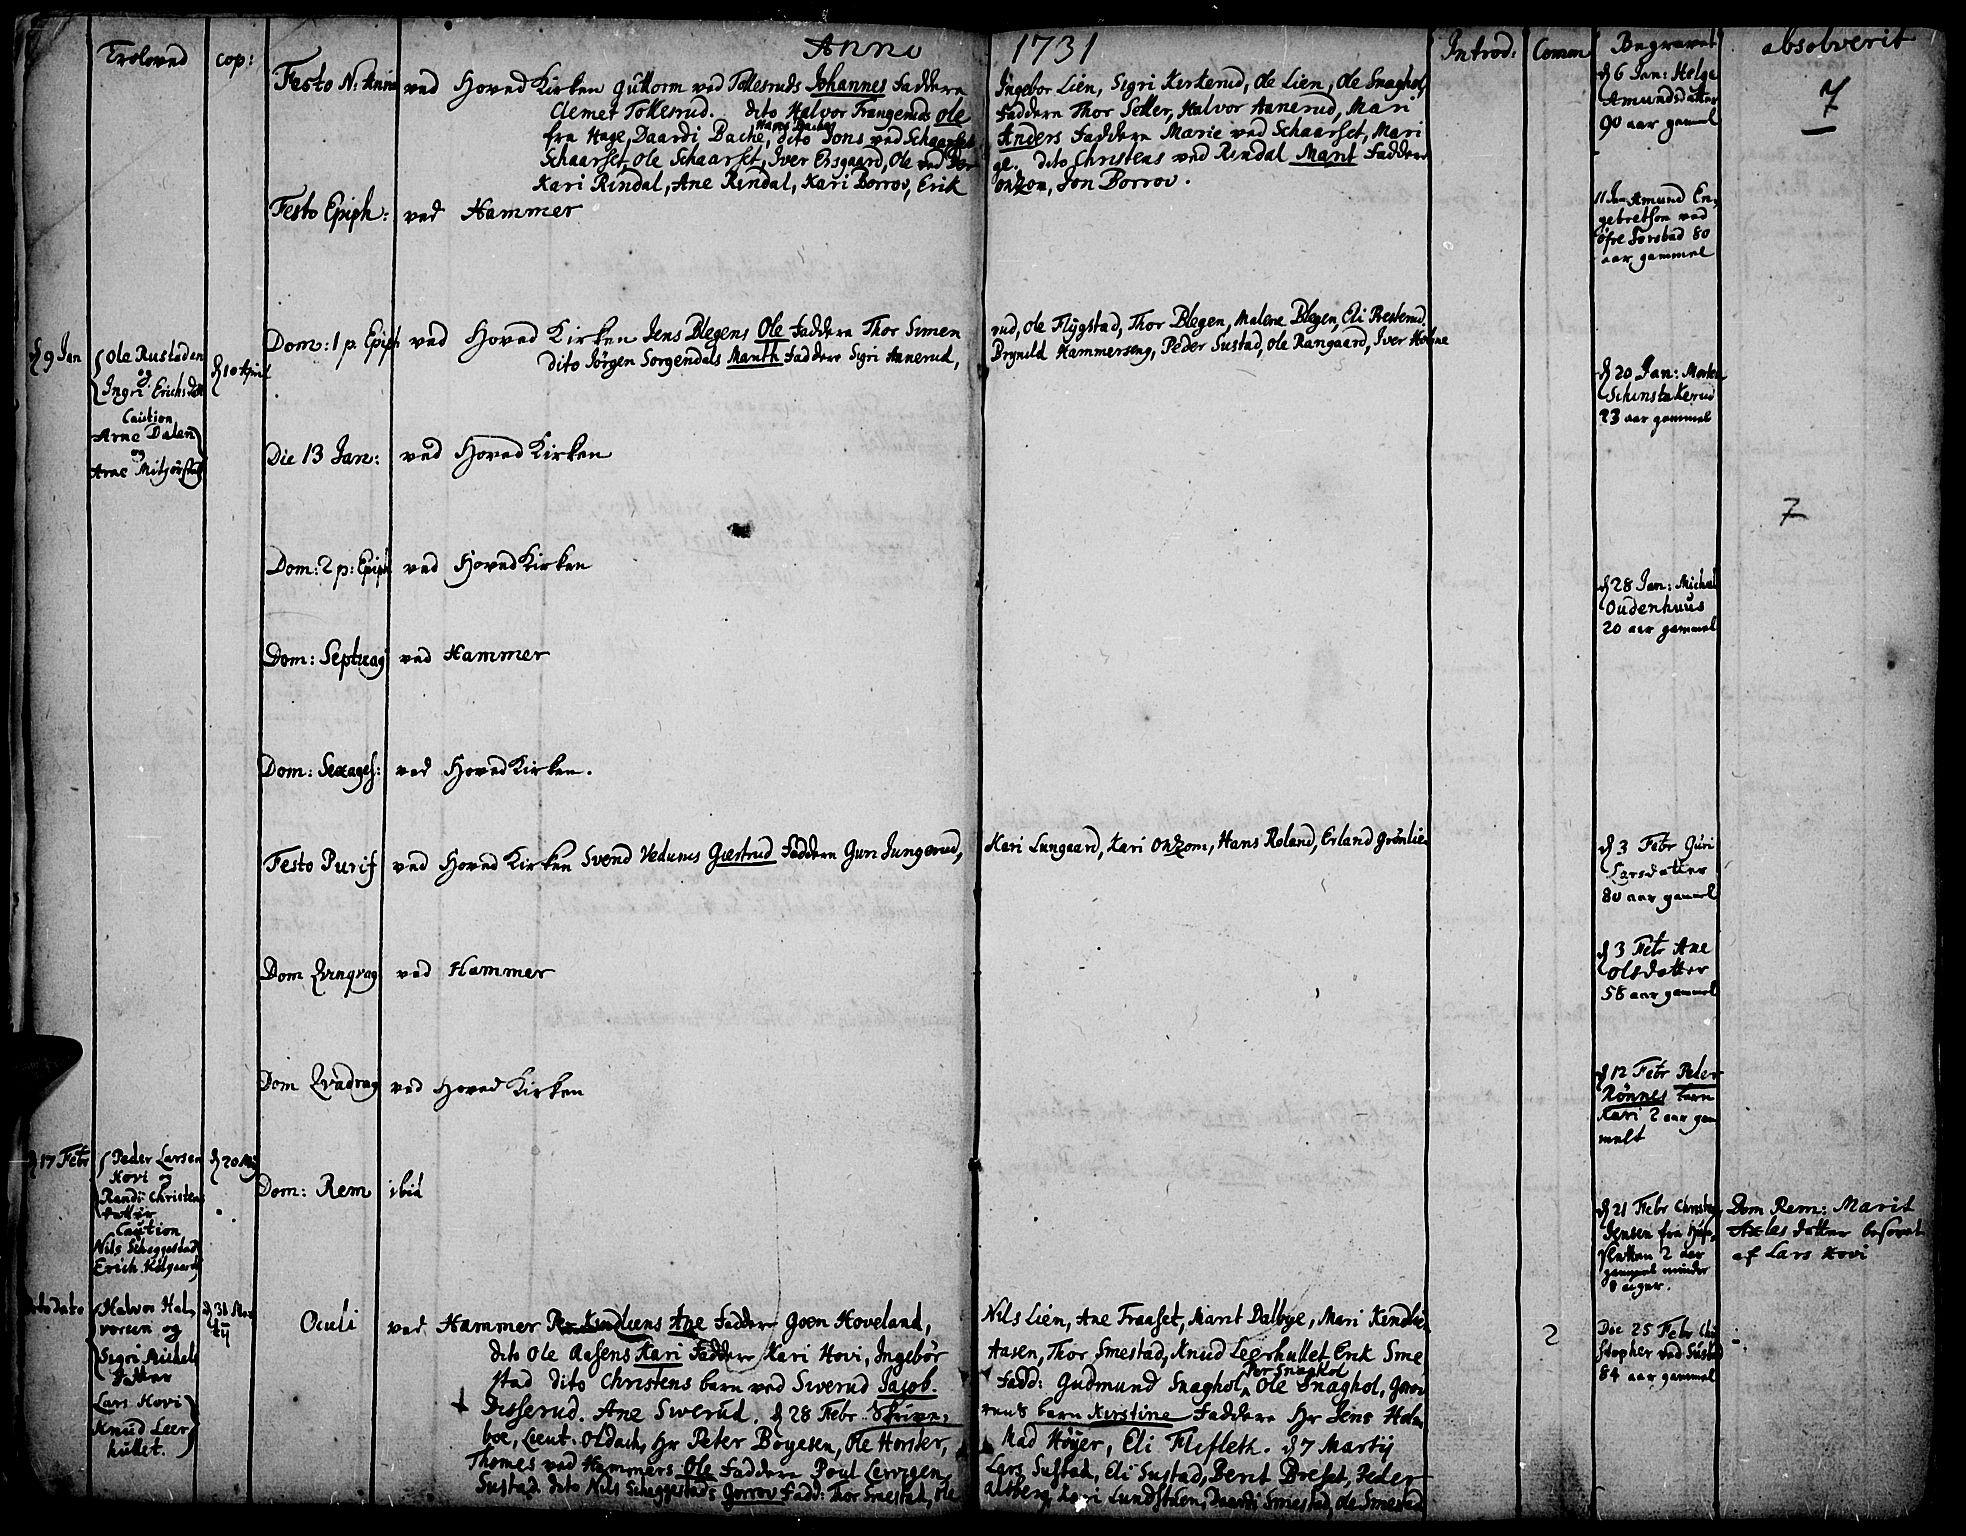 SAH, Fåberg prestekontor, Ministerialbok nr. 1, 1727-1775, s. 7